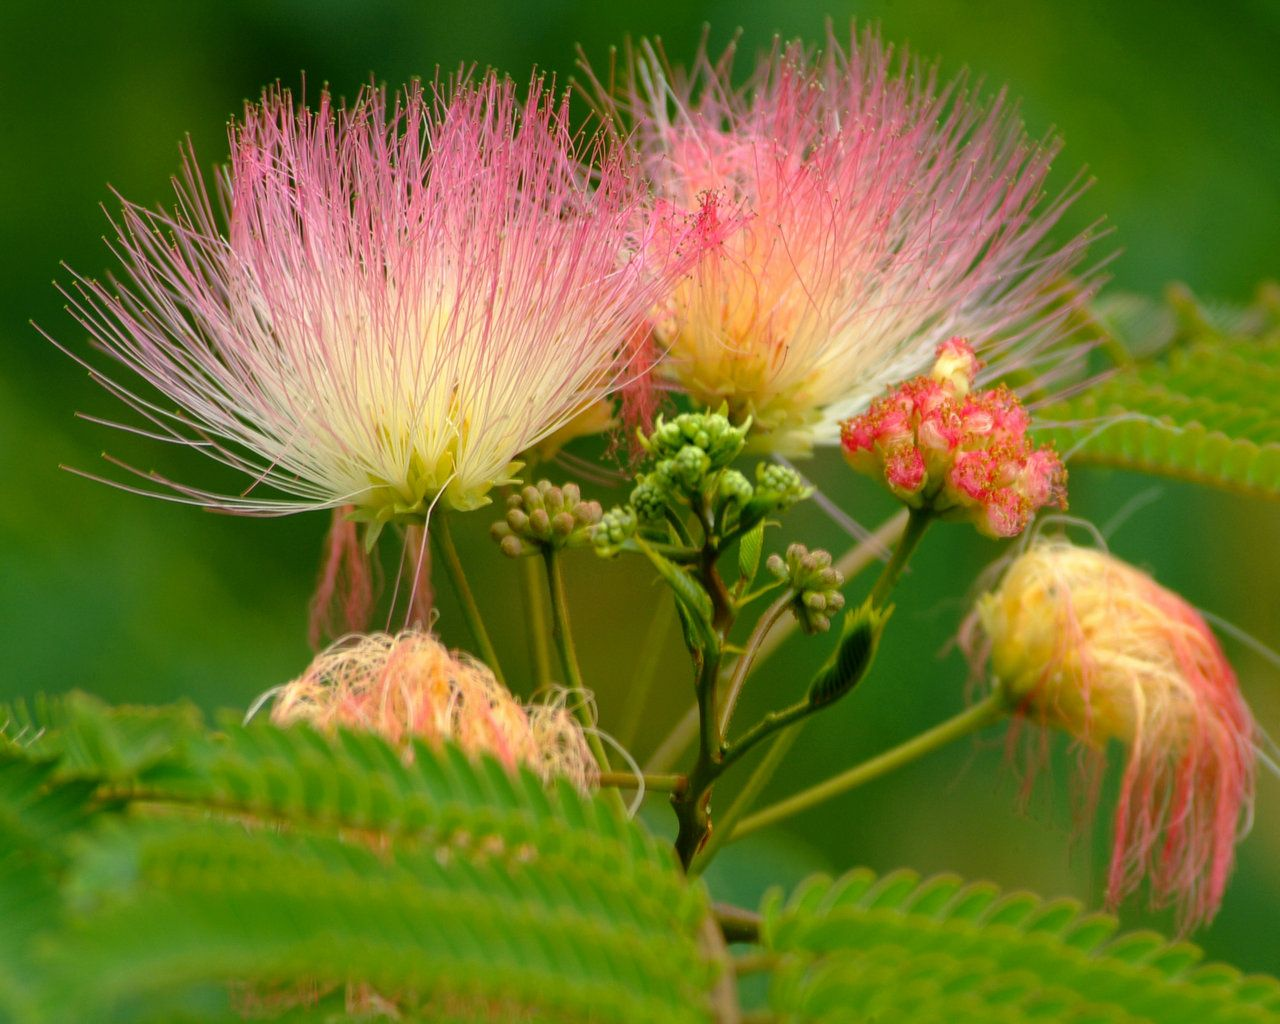 Albizia persian silk tree flower flowers gardens gardening albizia persian silk tree flower mightylinksfo